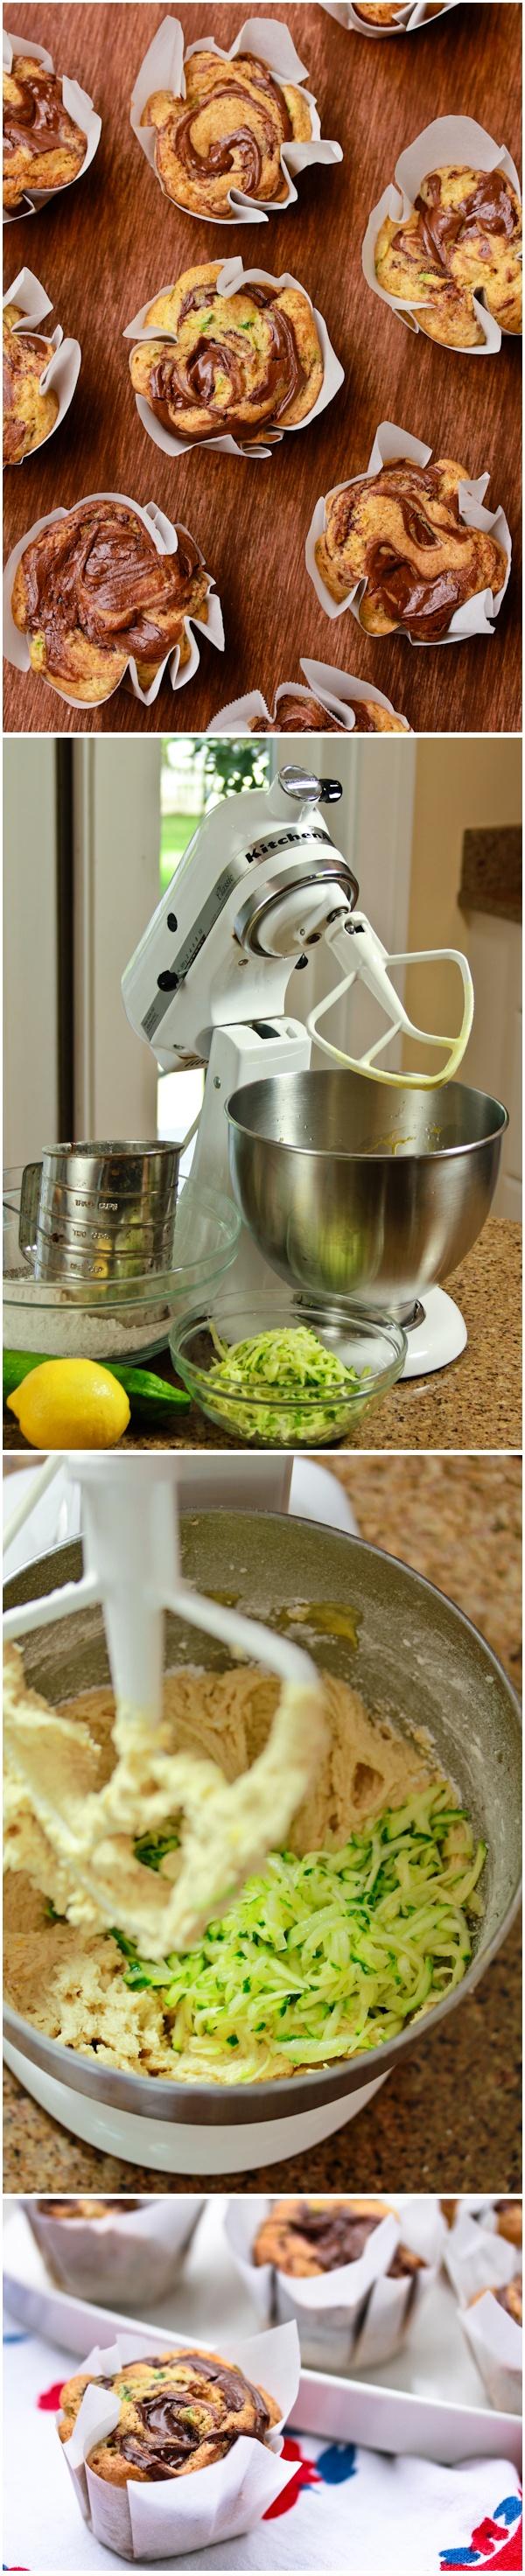 Zucchini Nutella Swirl Muffins Recipe | Muffins | Pinterest